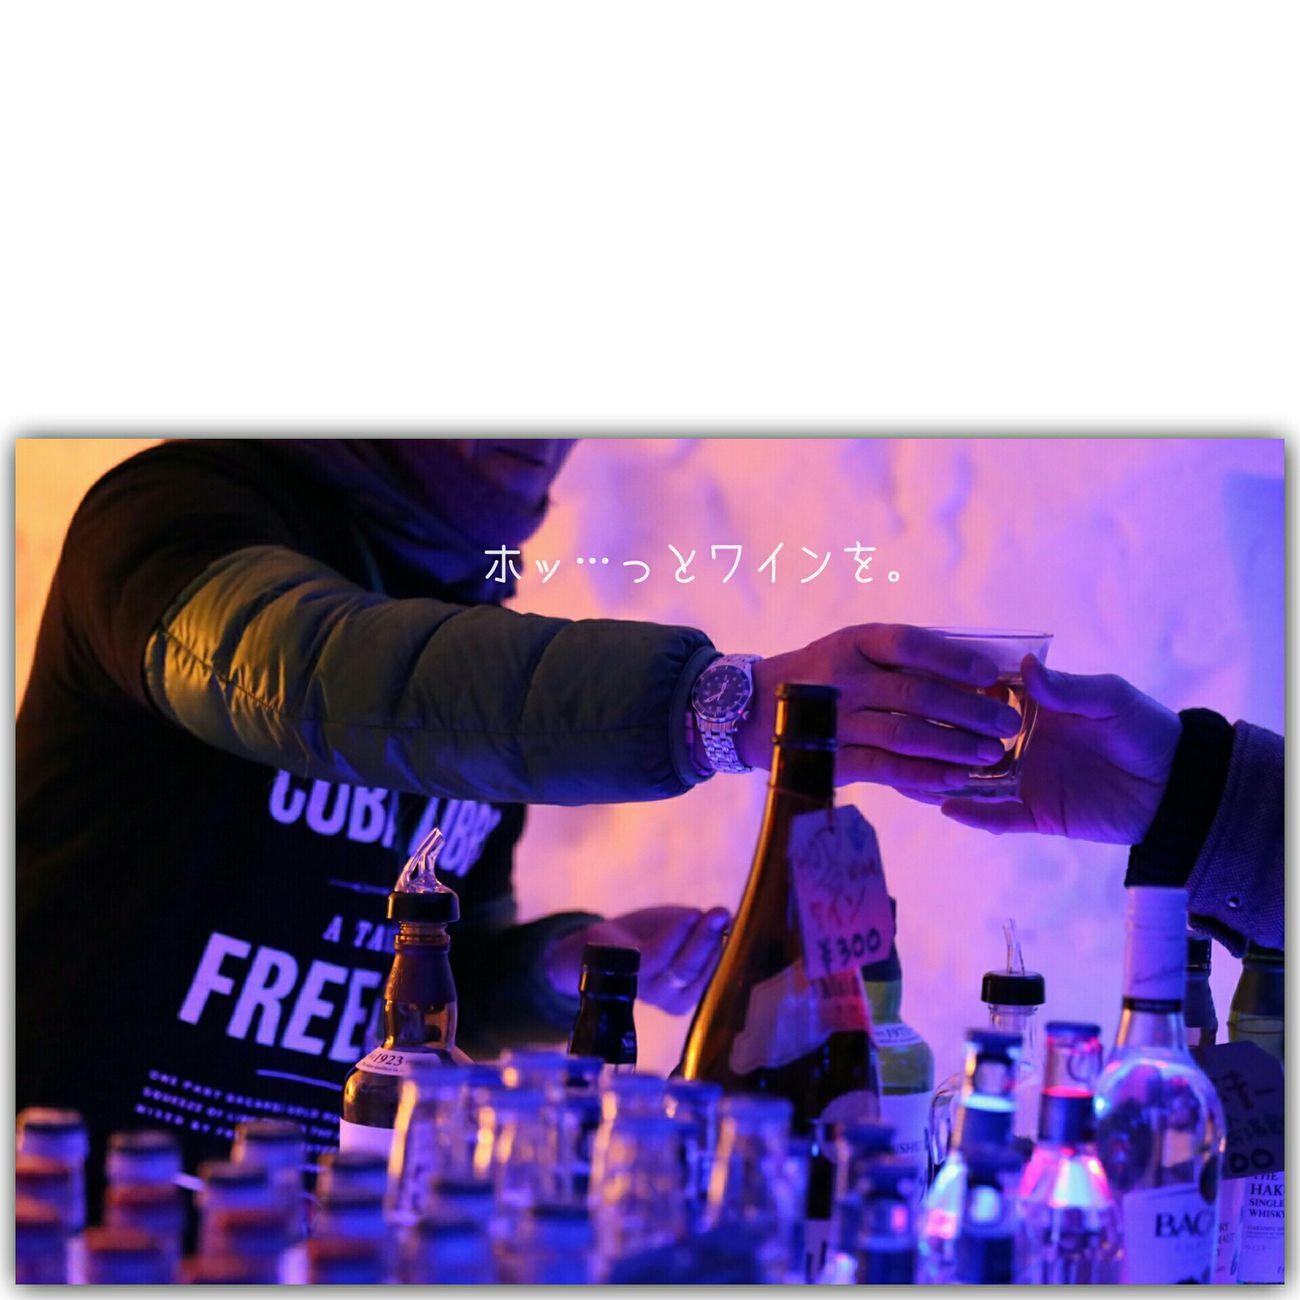 Ice Bar Alcohol Bottles Bottles Snowfestival Winter EyeEm Best Shots Blue Led Lamp 月山志津温泉雪旅籠の灯り YAMAGATA